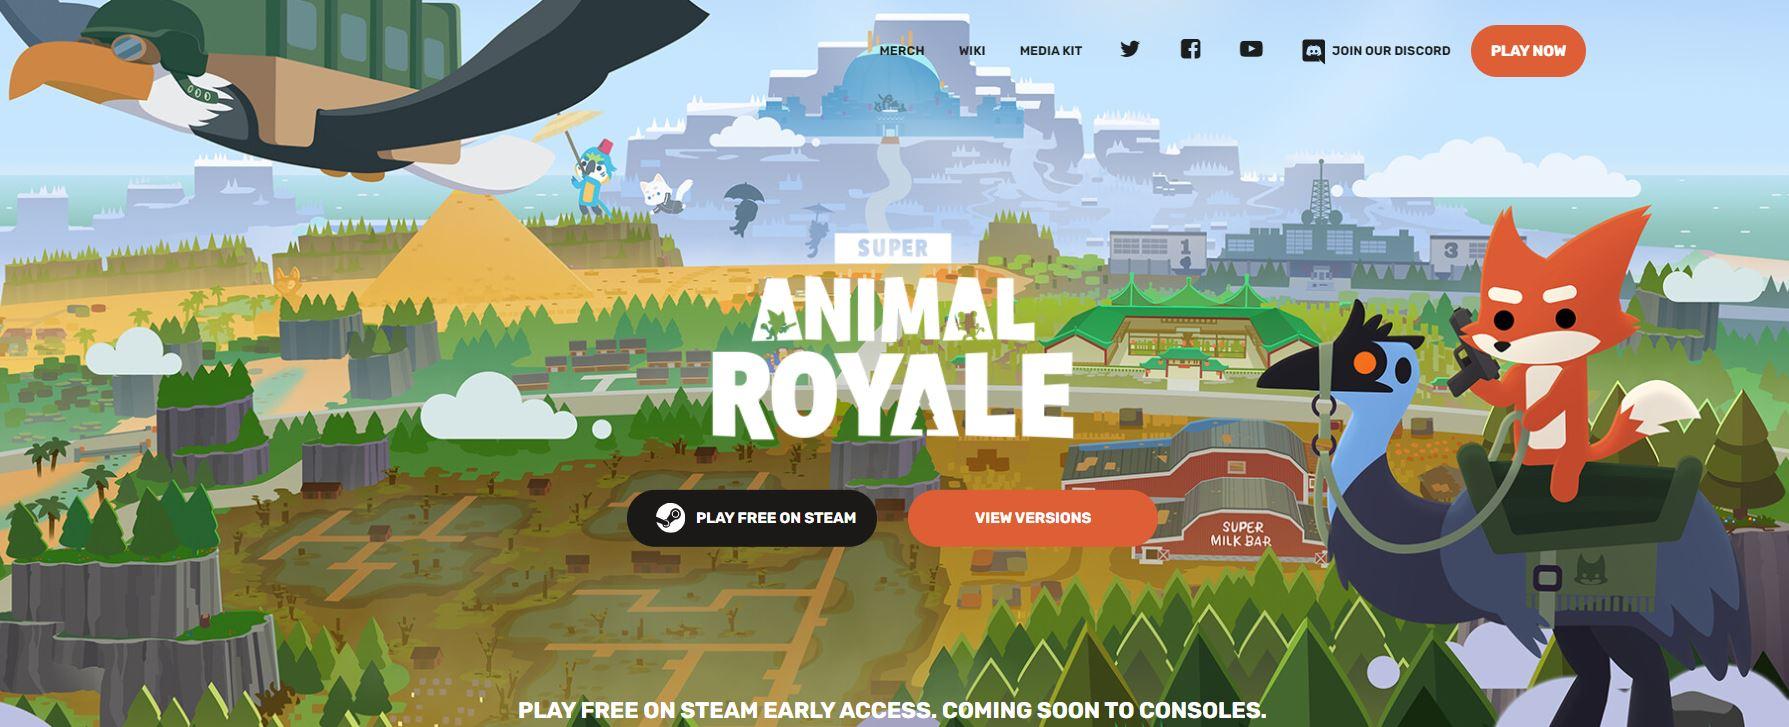 Super Animal Royale Codes